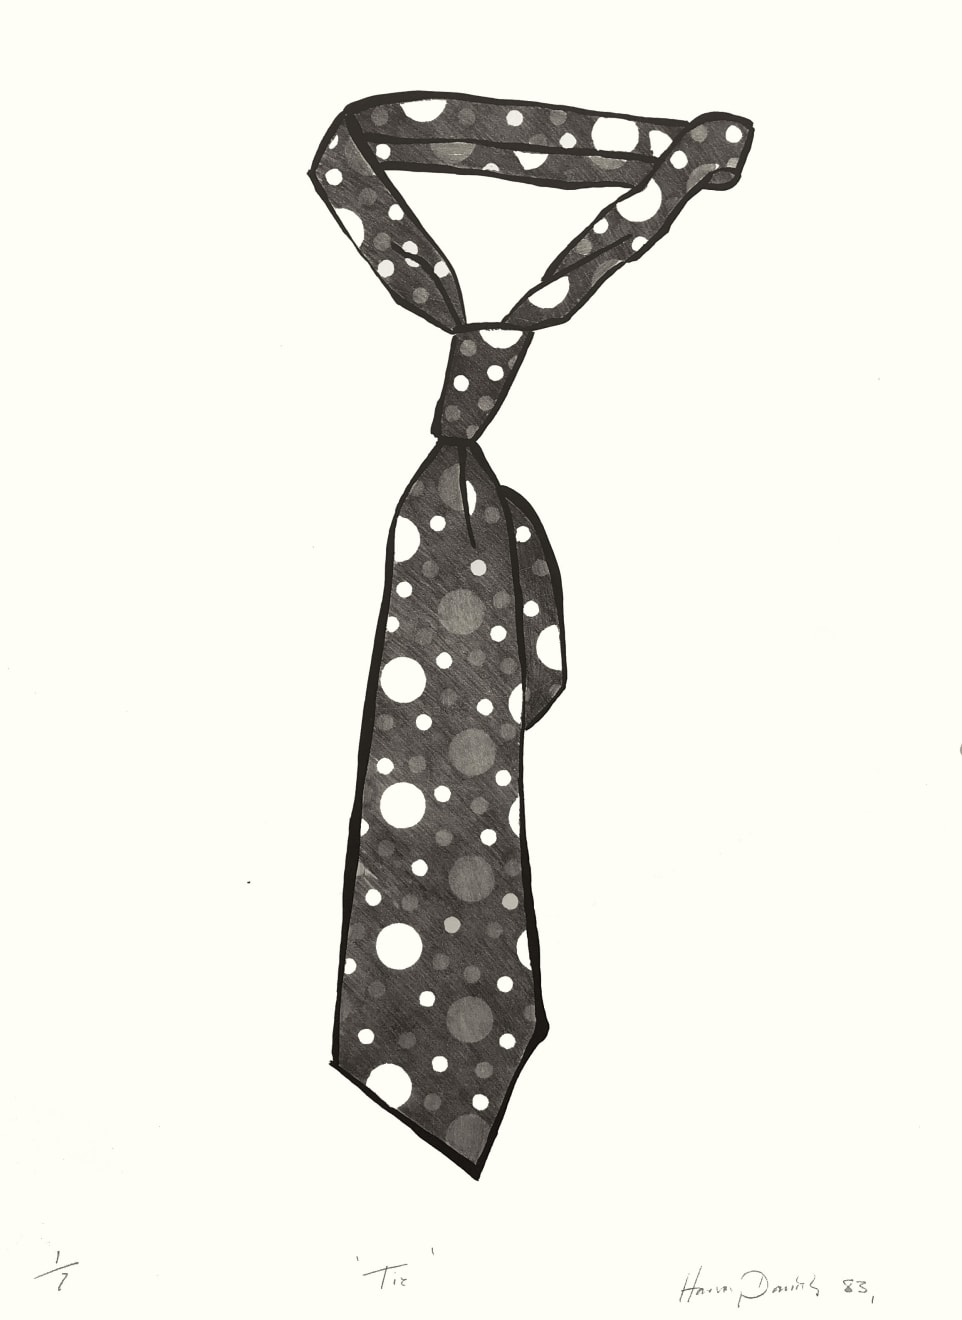 Harvey Daniels, Tie, 1983